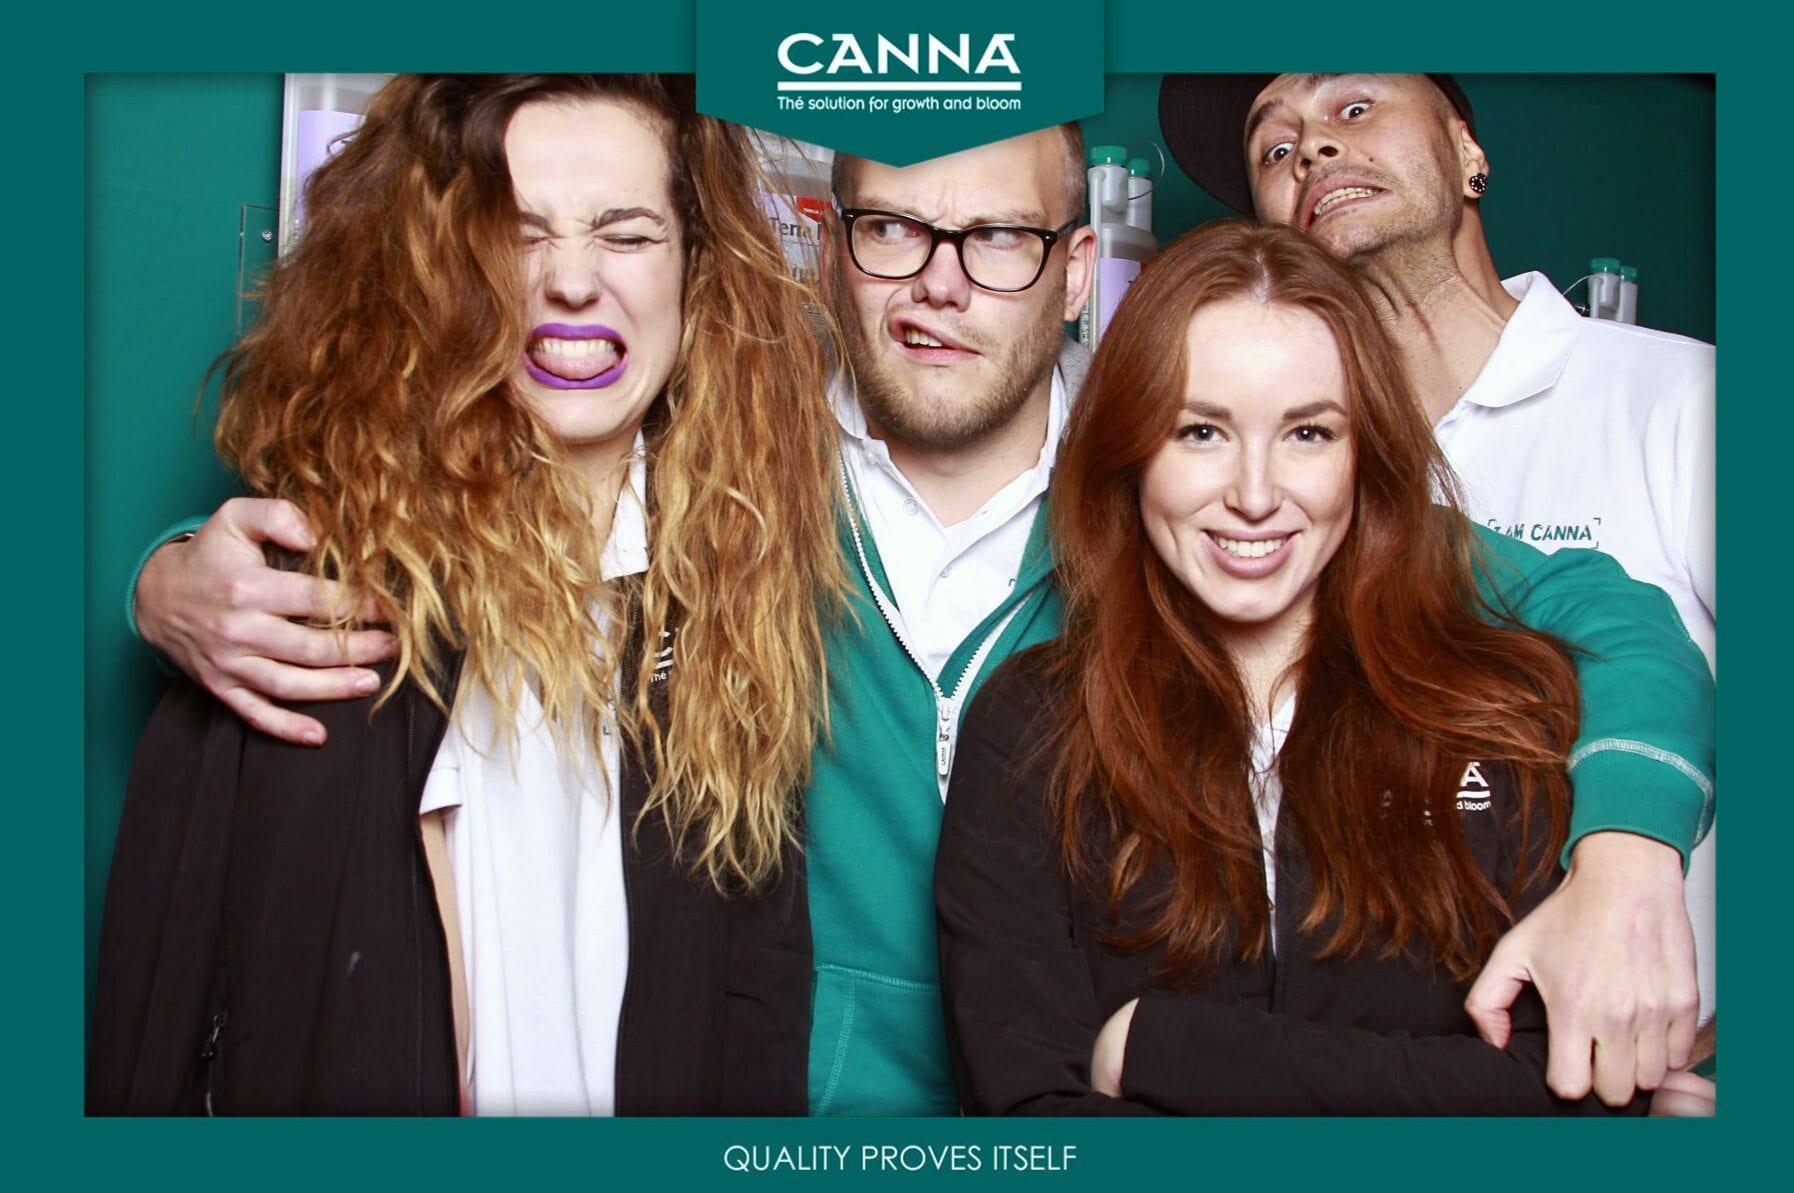 fotokoutek-canna-13-11-2016-157807